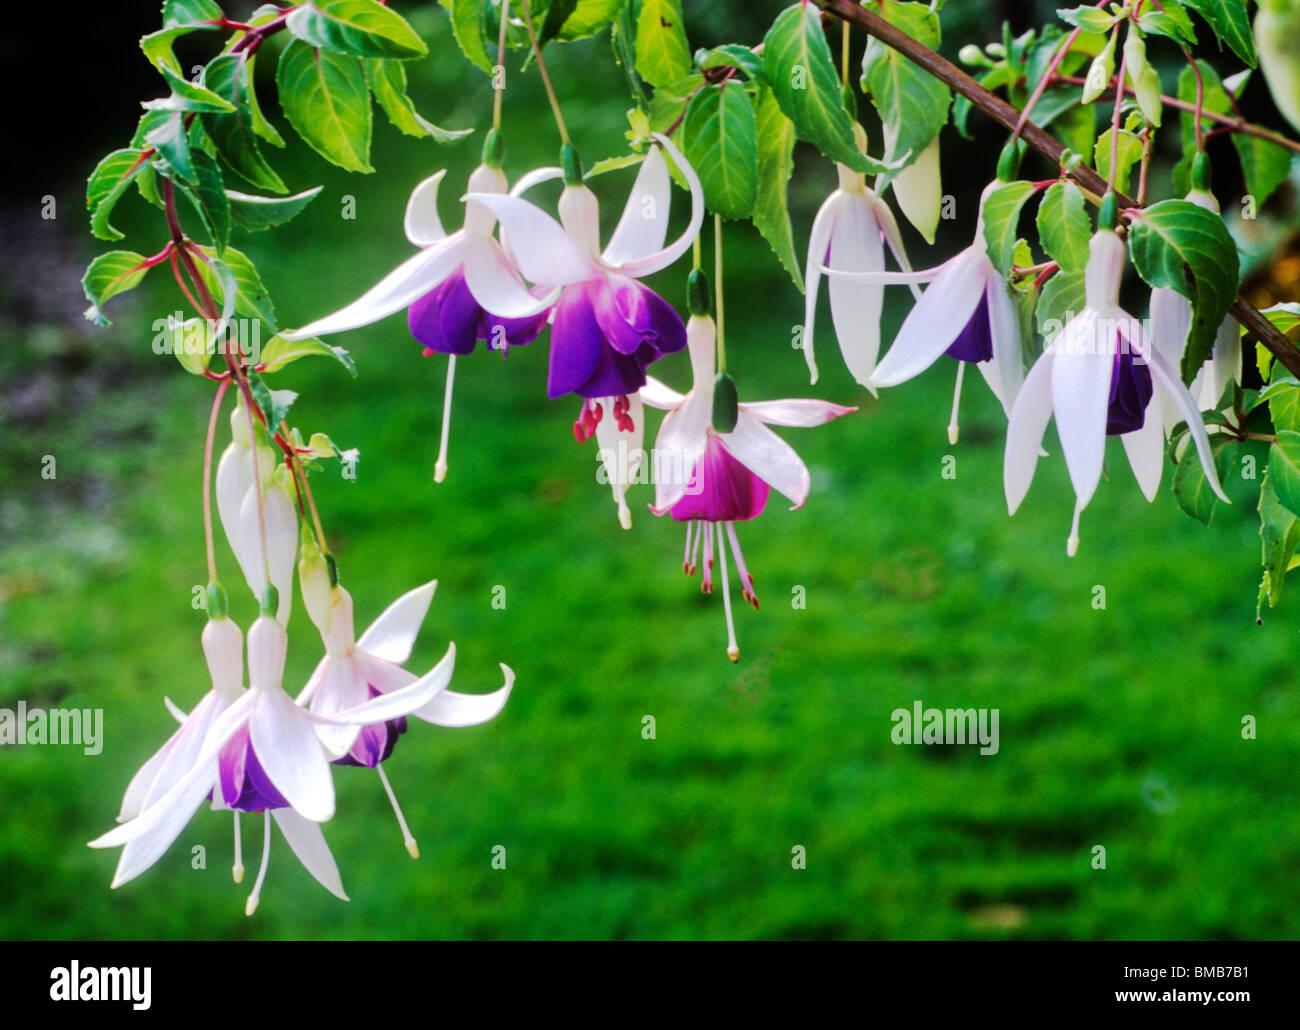 Fuschia deltaa sarah purple and white flower flowers garden plant fuschia deltaa sarah purple and white flower flowers garden plant plants izmirmasajfo Gallery